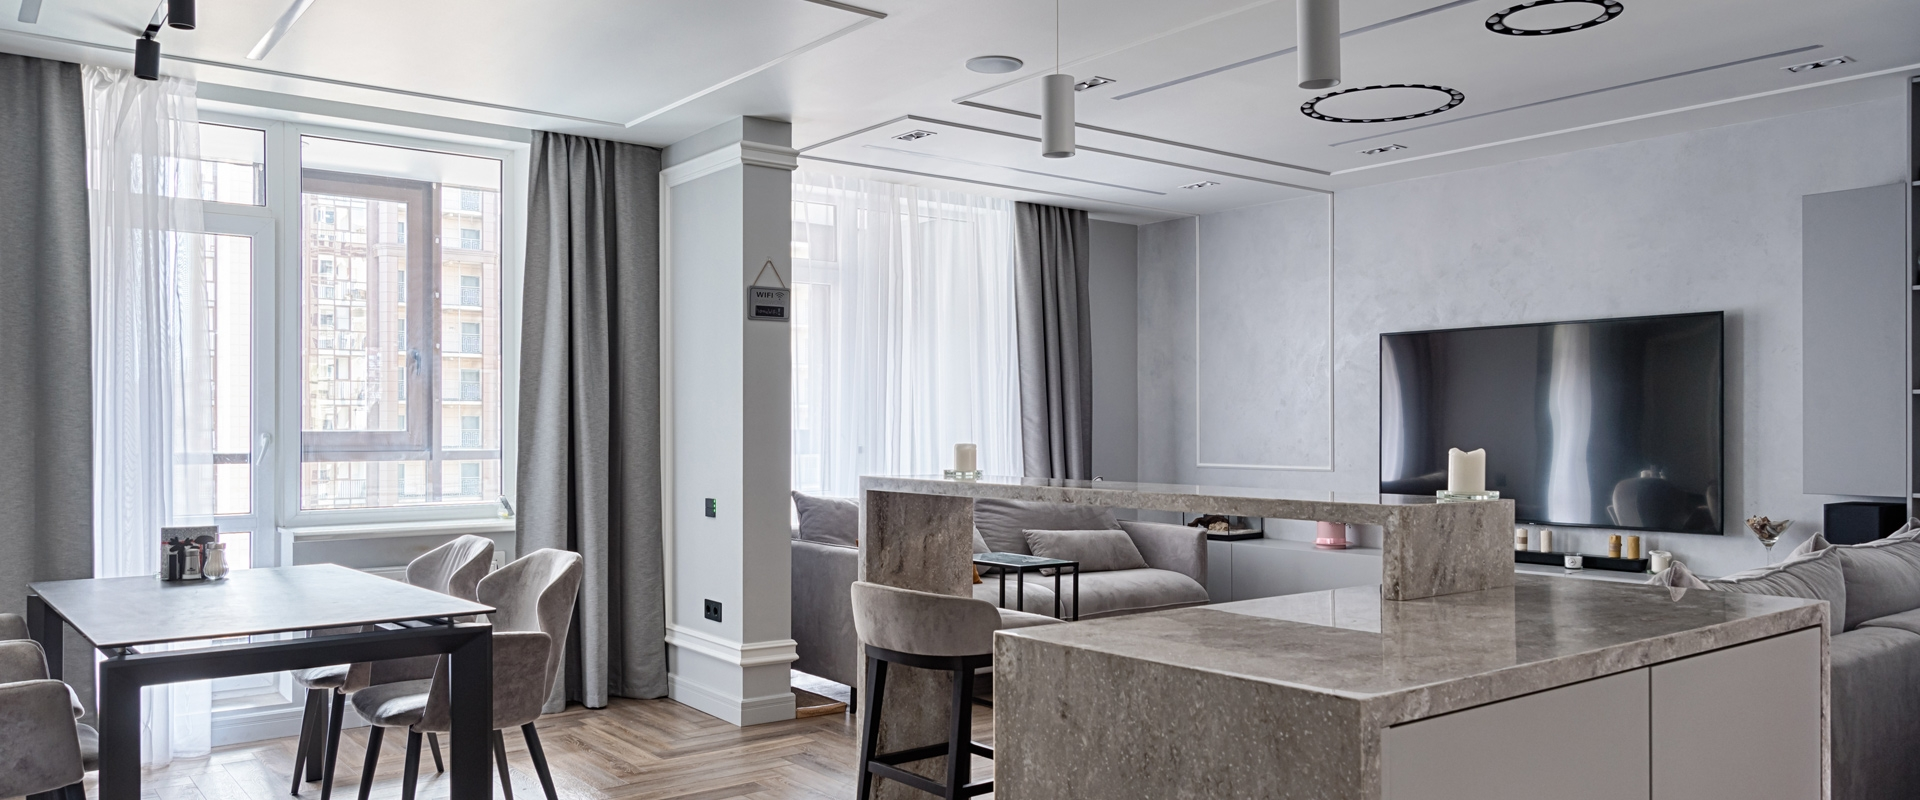 Un appartamento smart a San Pietroburgo